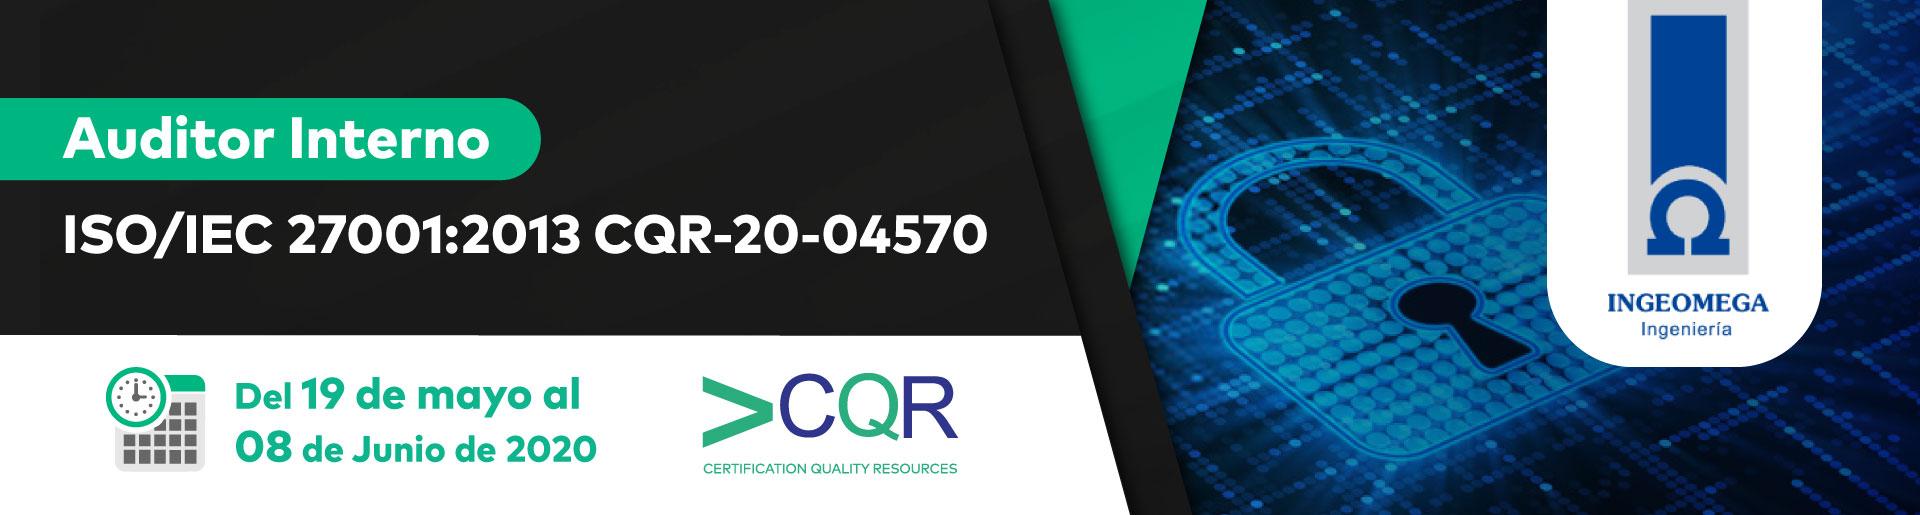 Auditor Interno ISO 27001 CQR